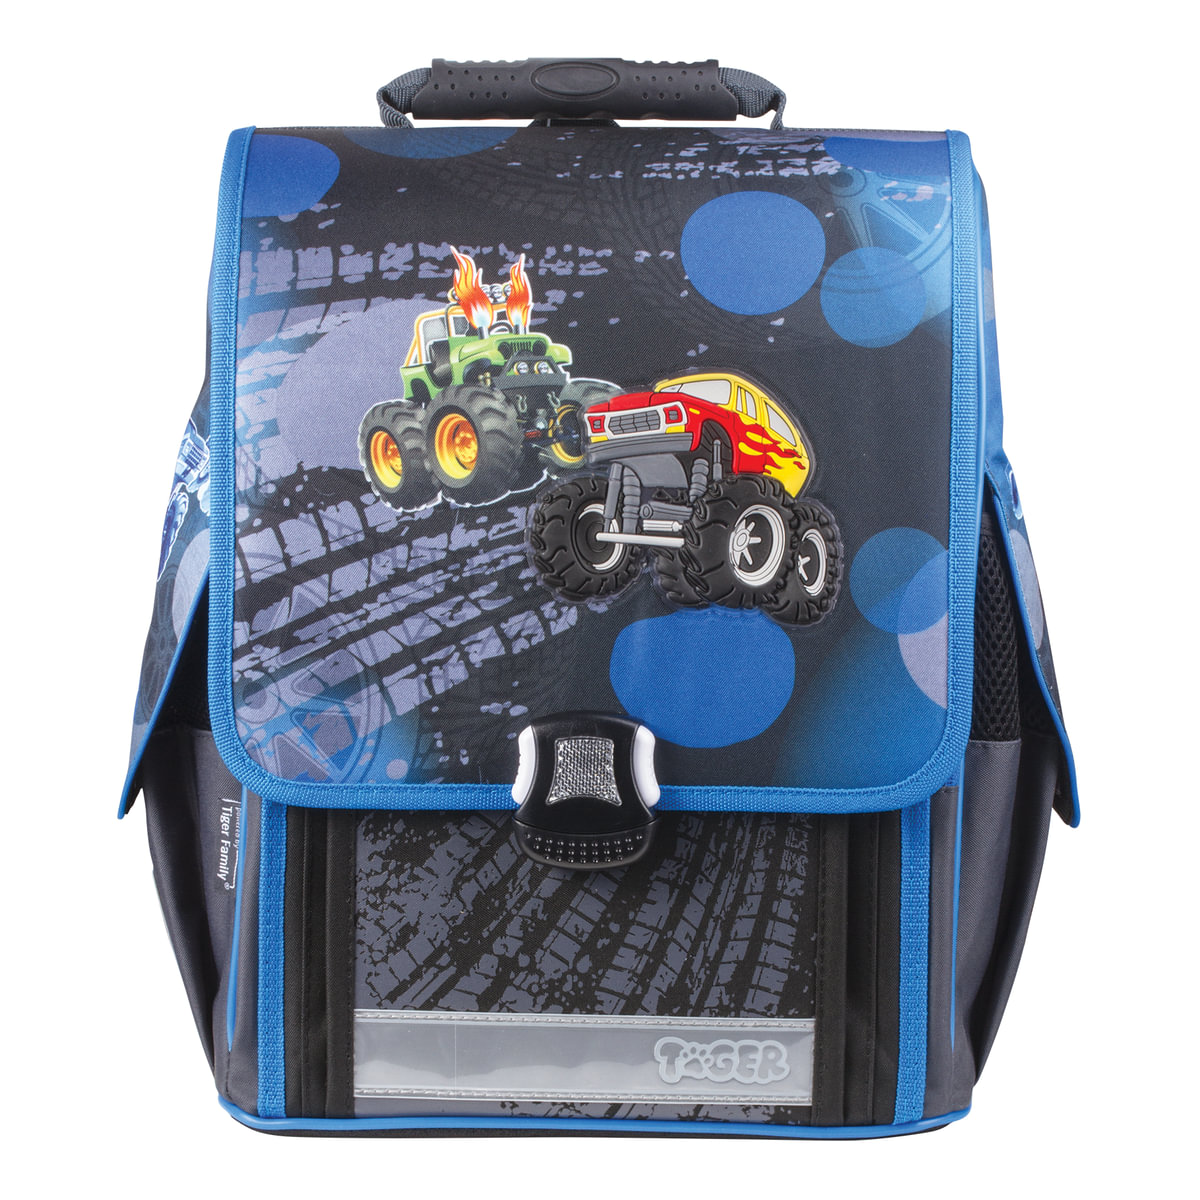 ca7b3fe5eed6 Рюкзаки Tiger Family - каталог цен, где купить в интернет-магазинах ...